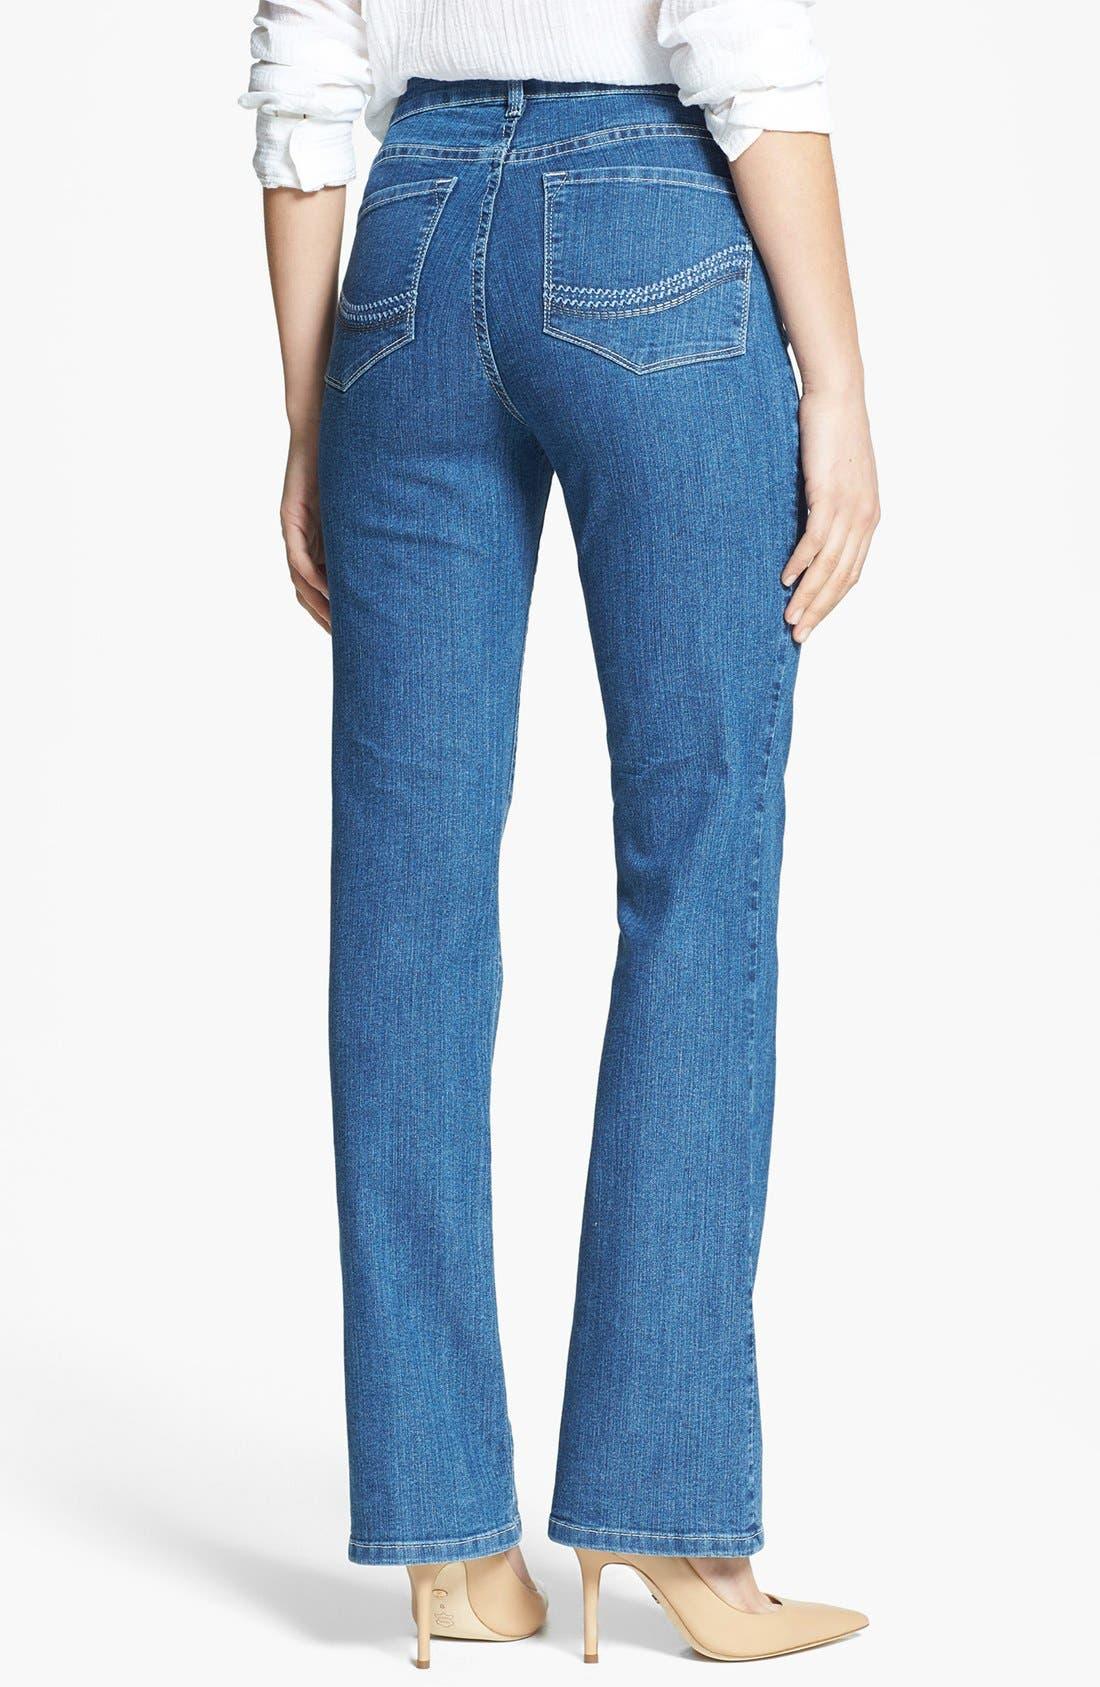 Alternate Image 2  - NYDJ 'Barbara' Embellished Pocket Stretch Bootcut Jeans (Maryland)